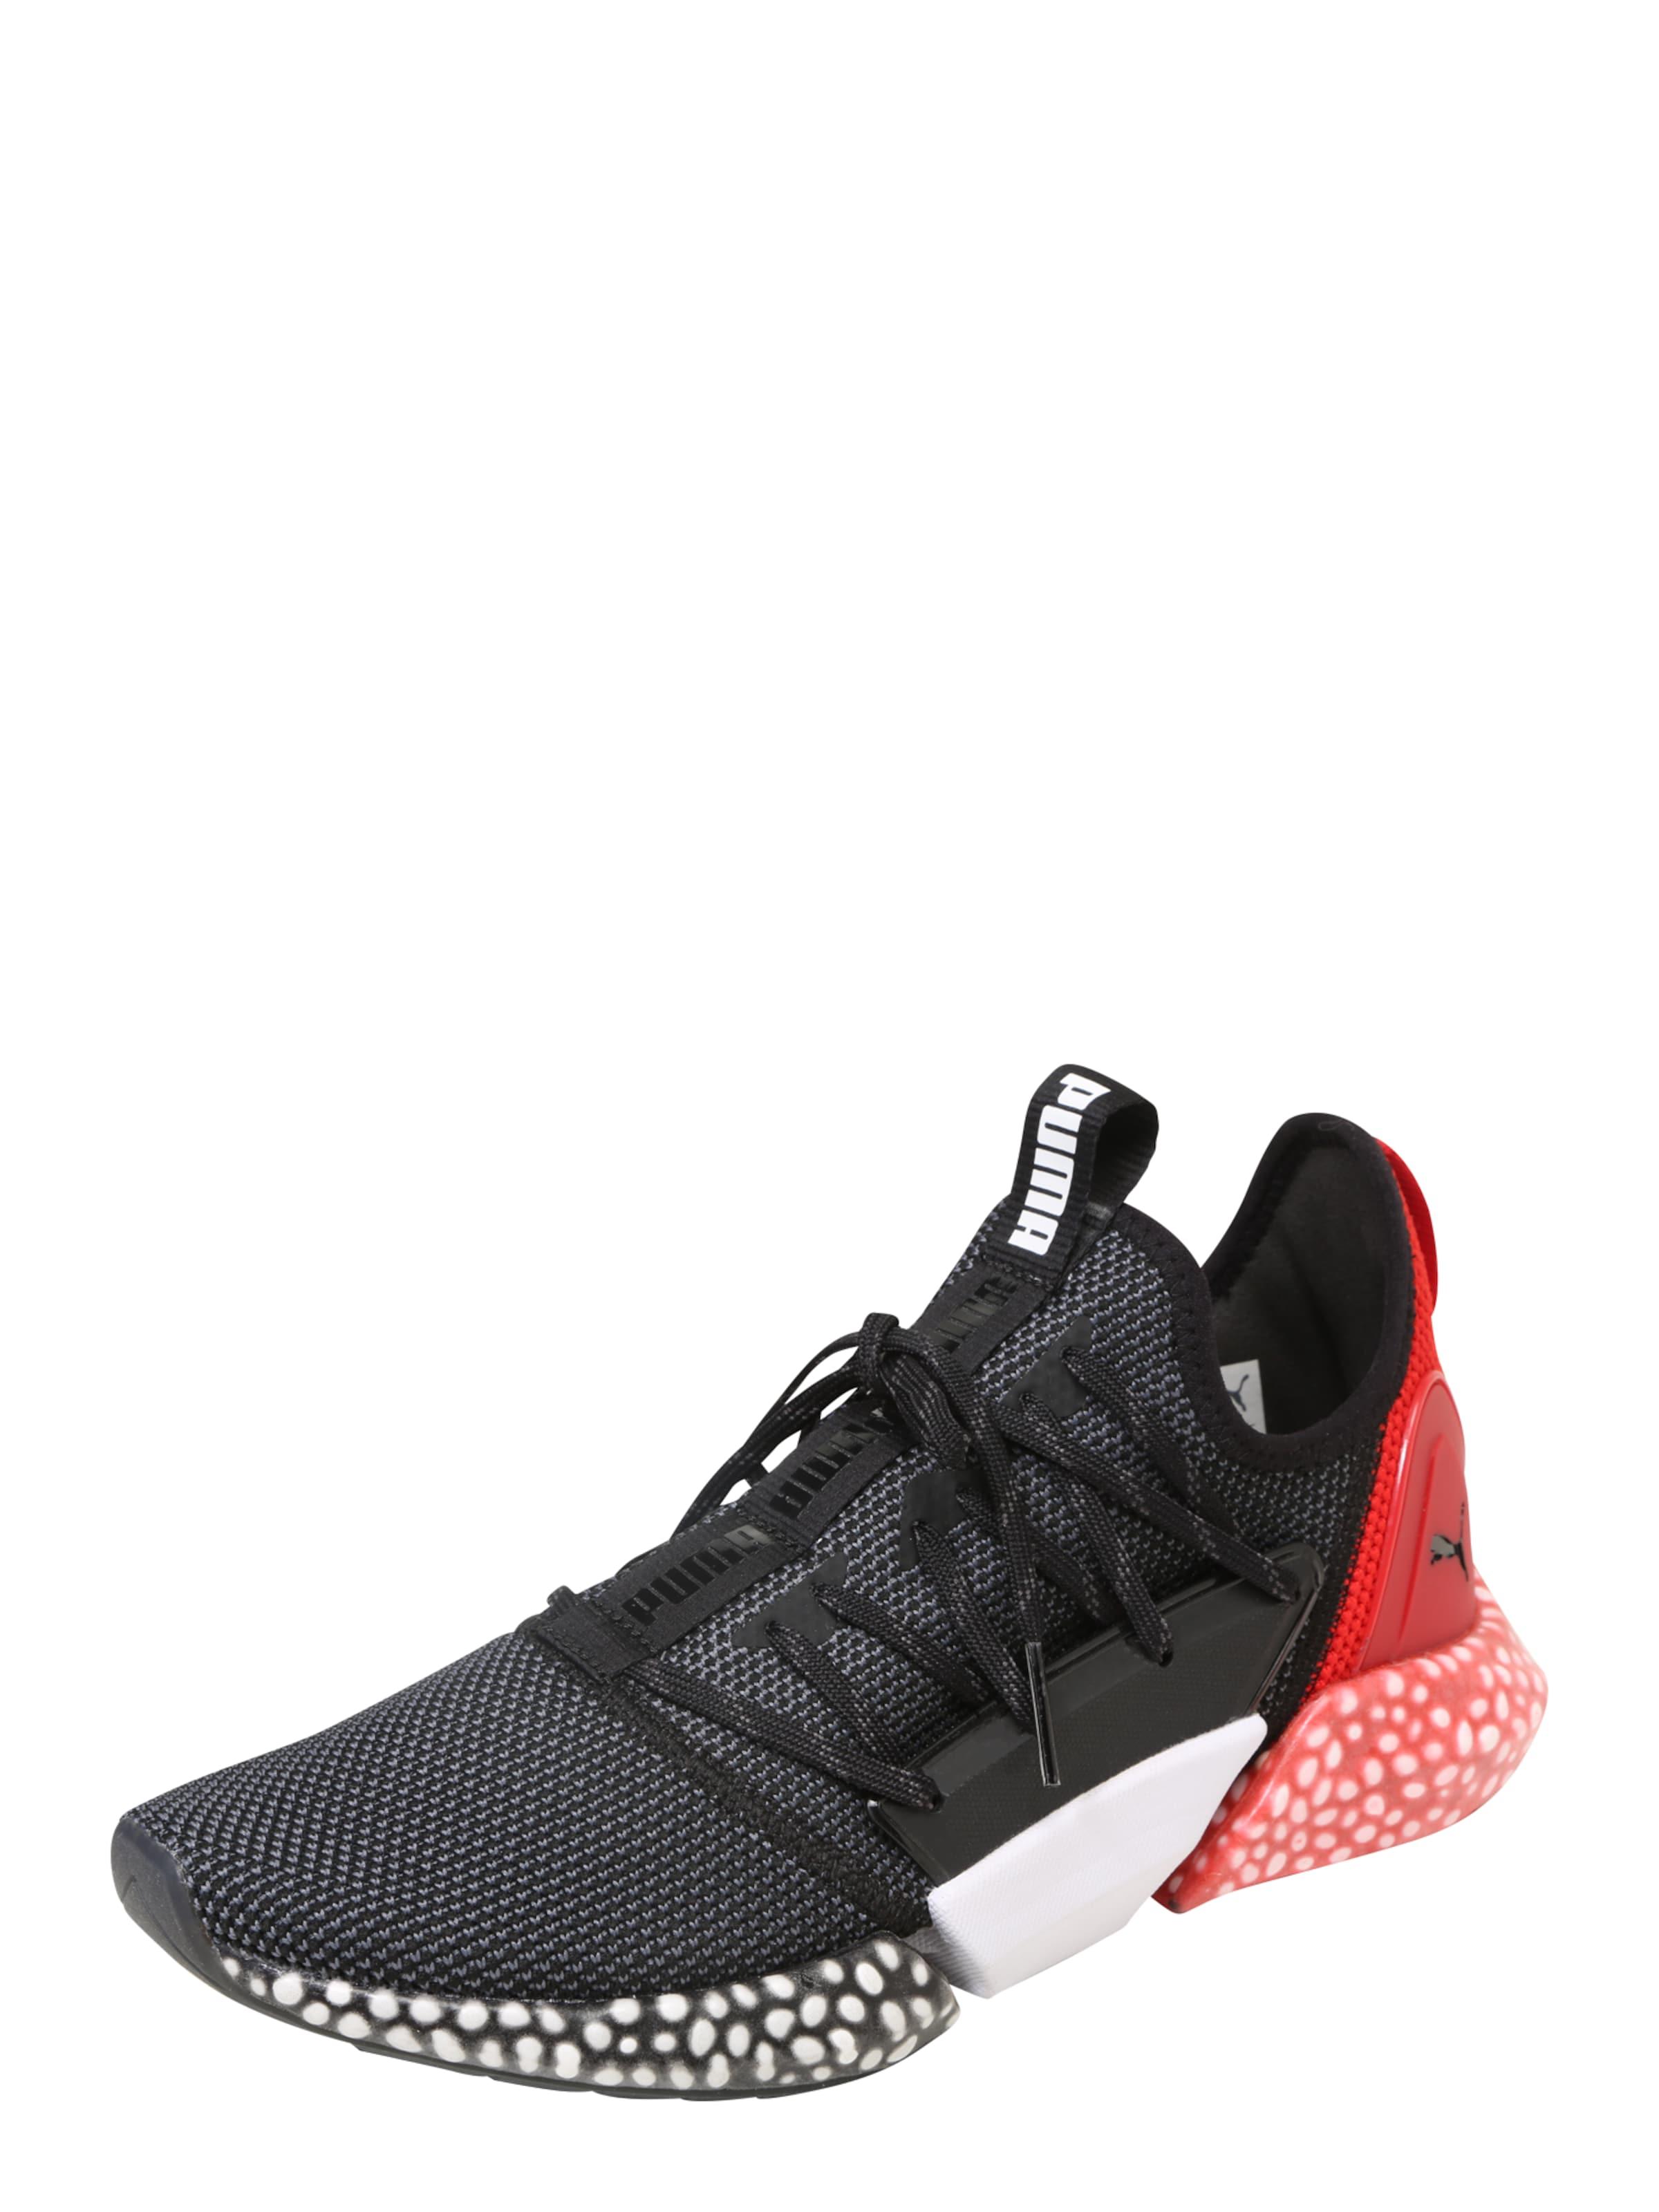 PUMA Sneaker Hybrid Rocket Runner Hohe Qualität